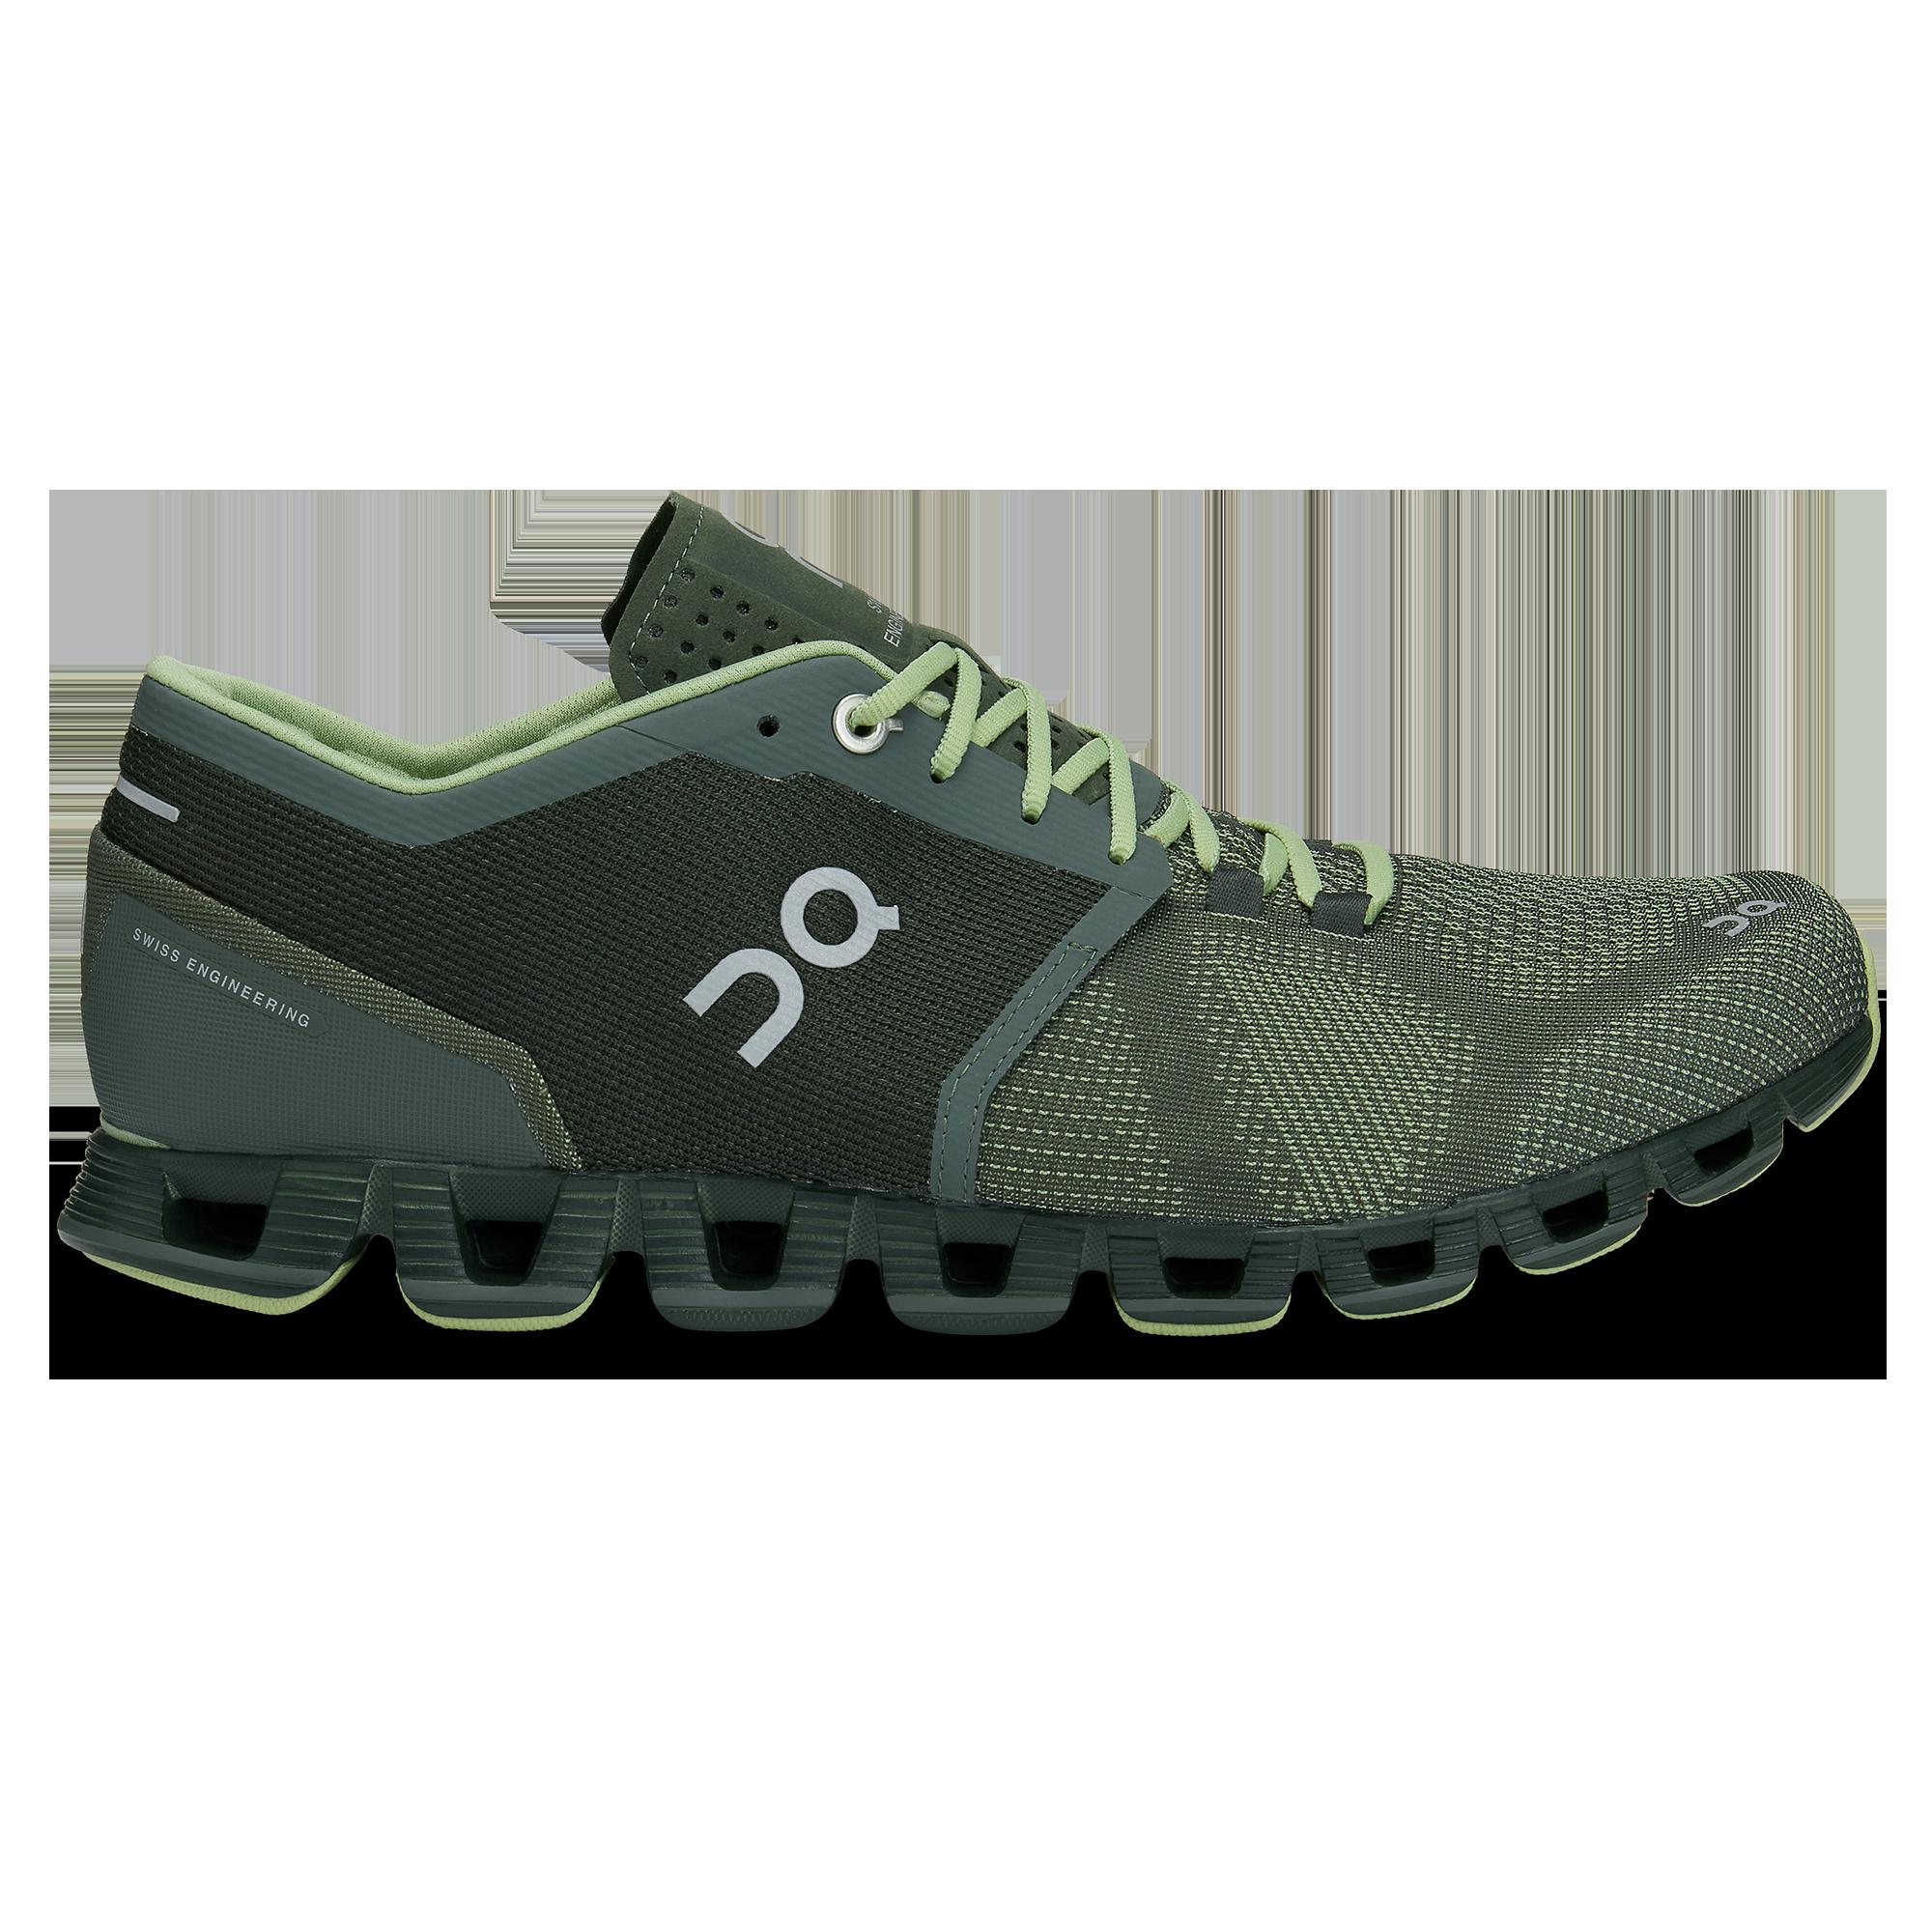 bee3c31ba50 Cloud X - Workout & Training Shoe   On